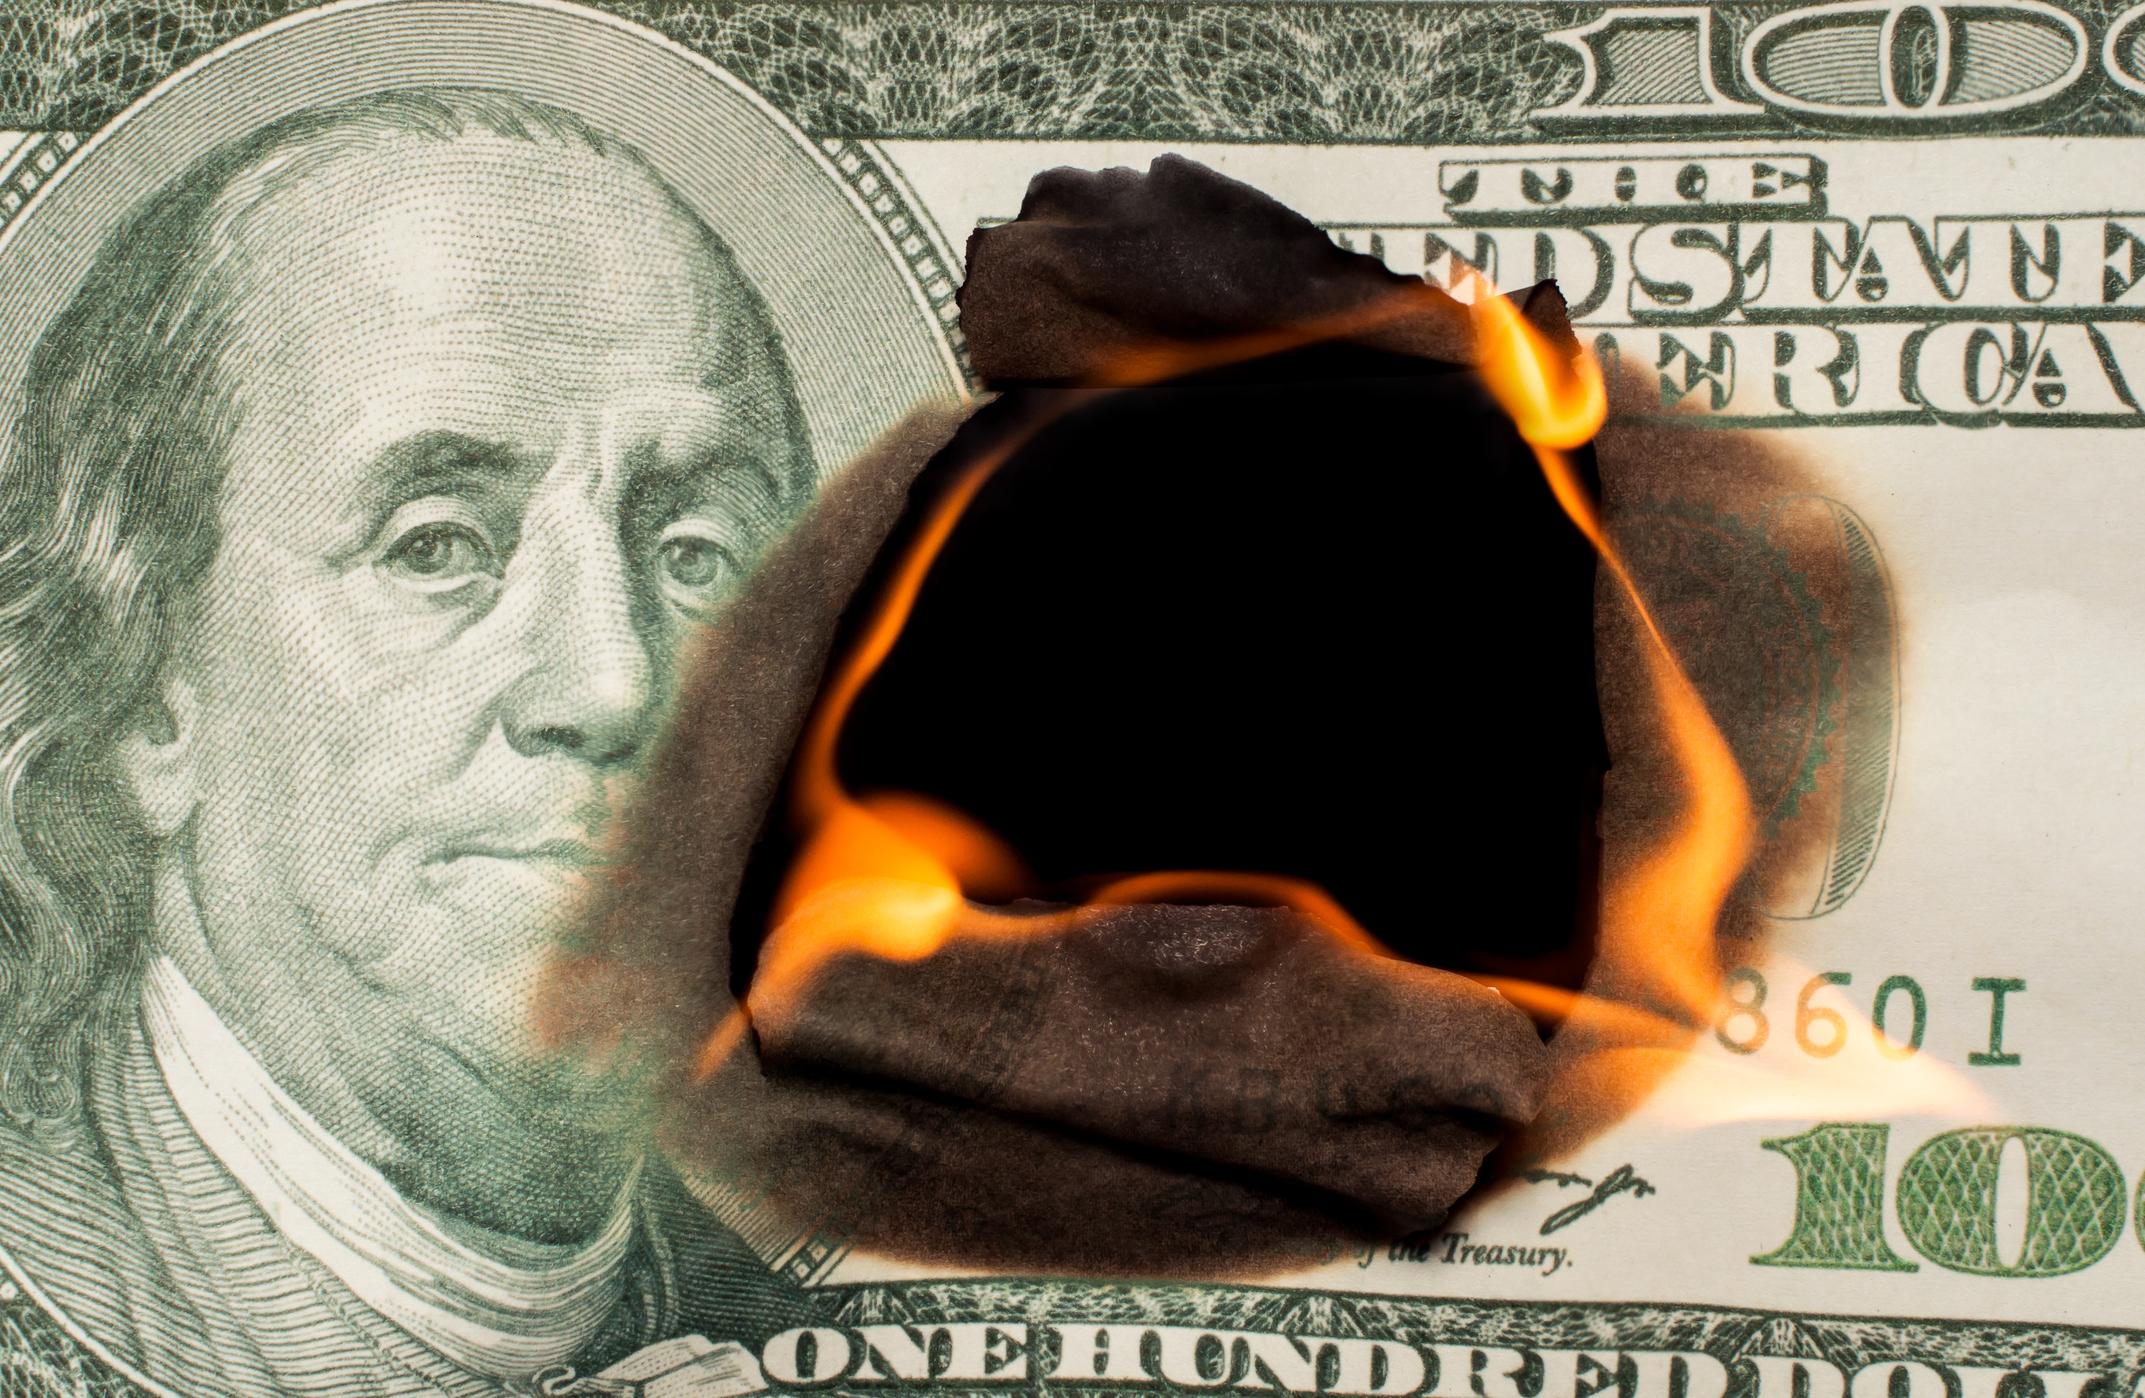 A hundred dollar bill burning from the center outward.